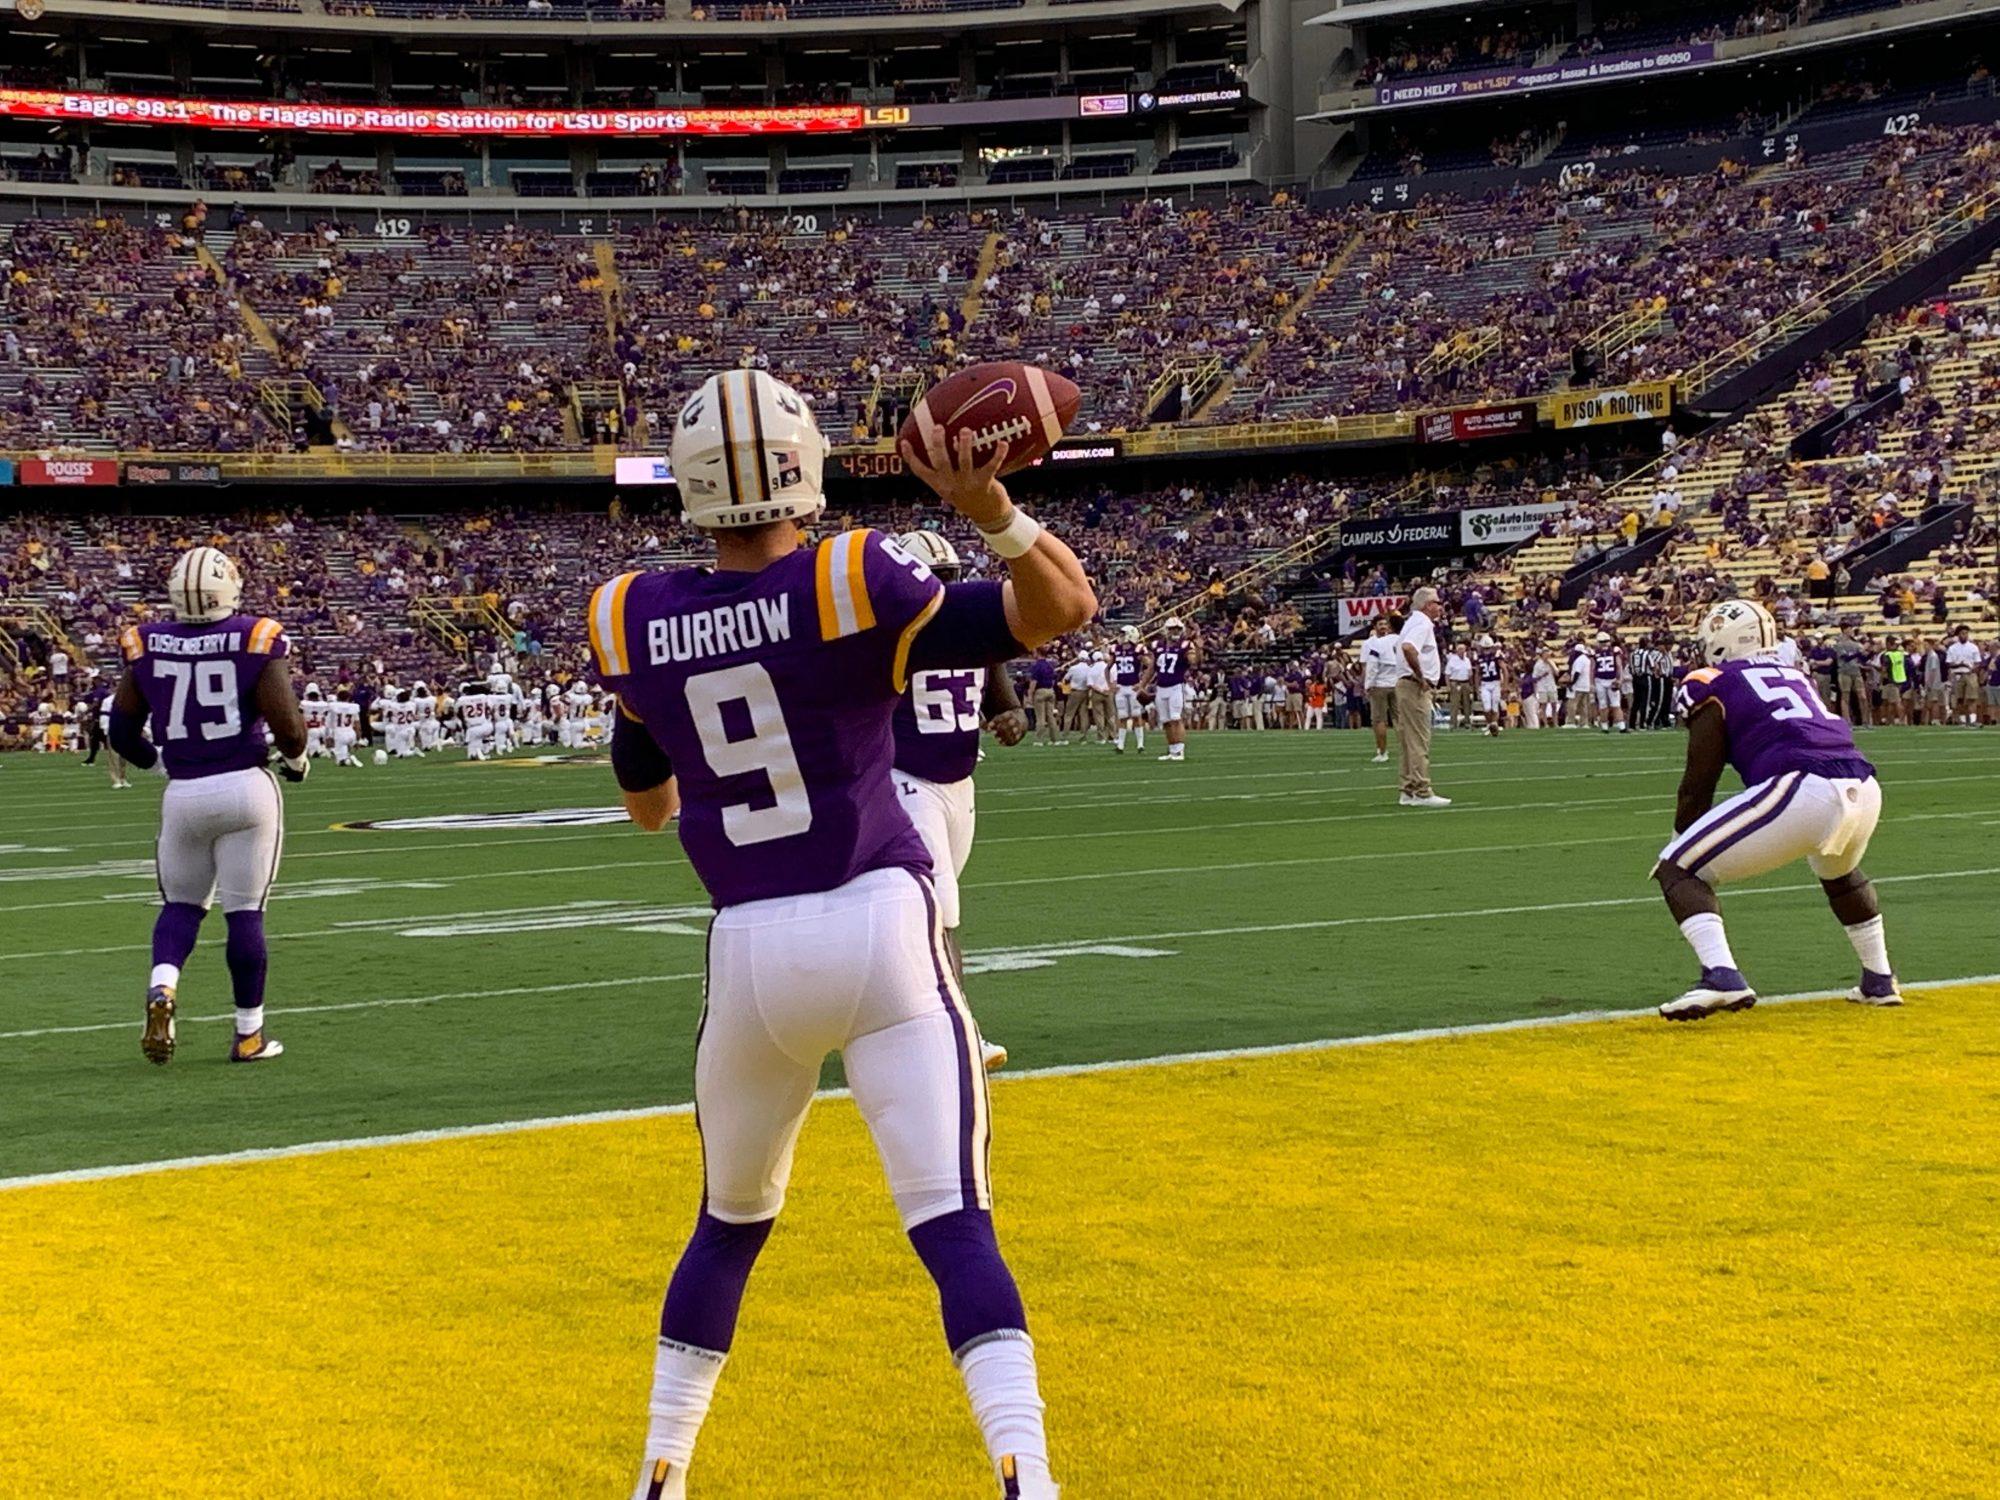 NFL Scout says Joe Burrow reminds him of Peyton Manning